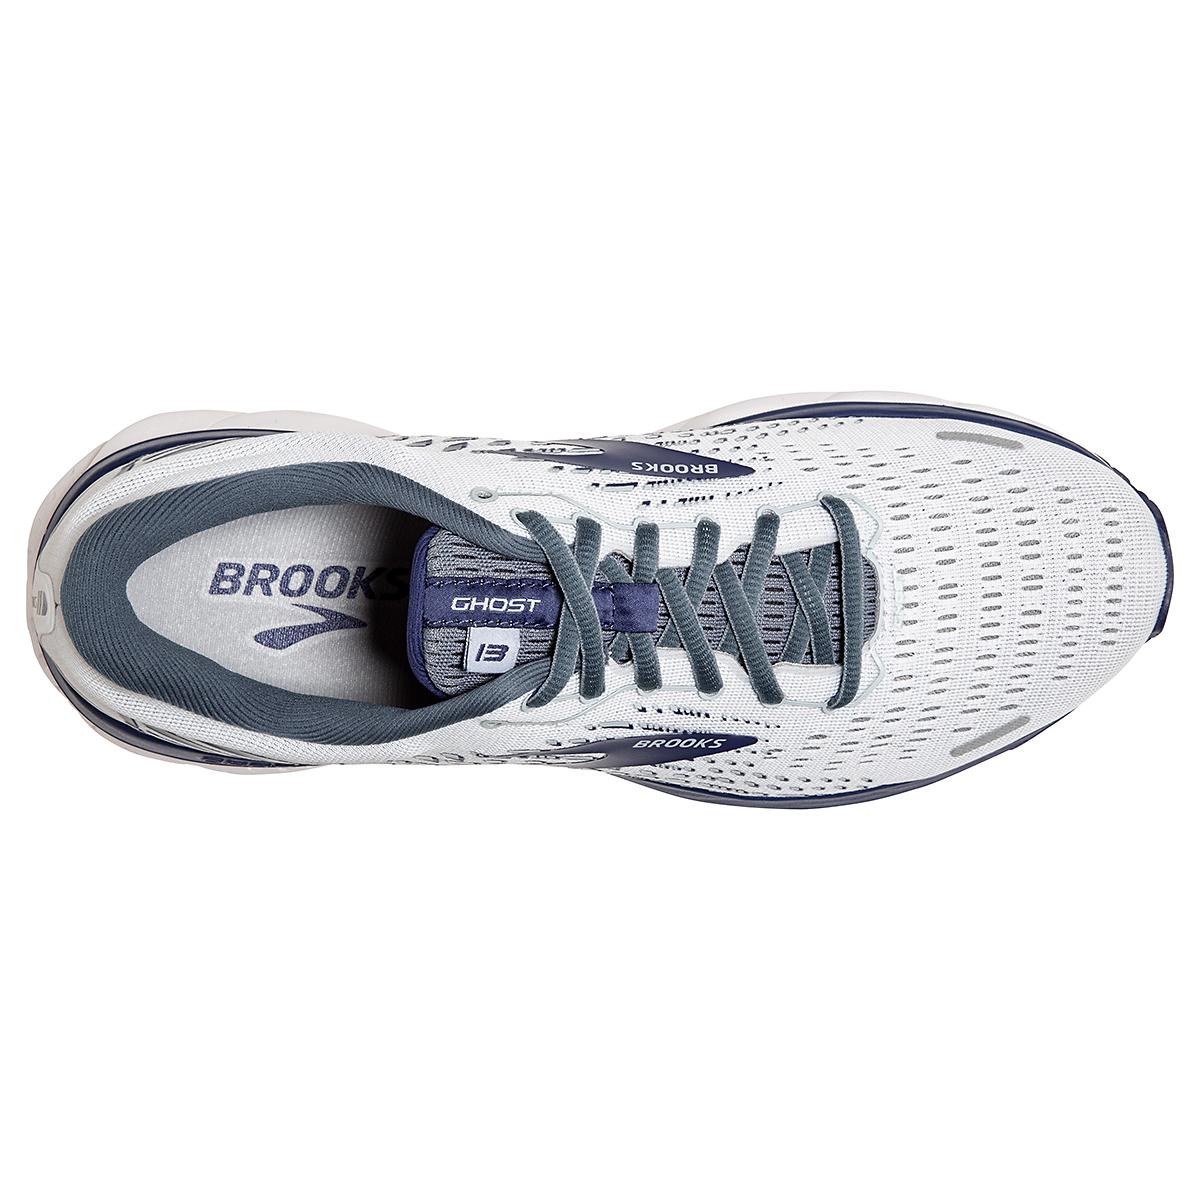 Men's Brooks Ghost 13 Running Shoe - Color: White/Grey/Deep Blue - Size: 7 - Width: Regular, White/Grey/Deep Blue, large, image 3